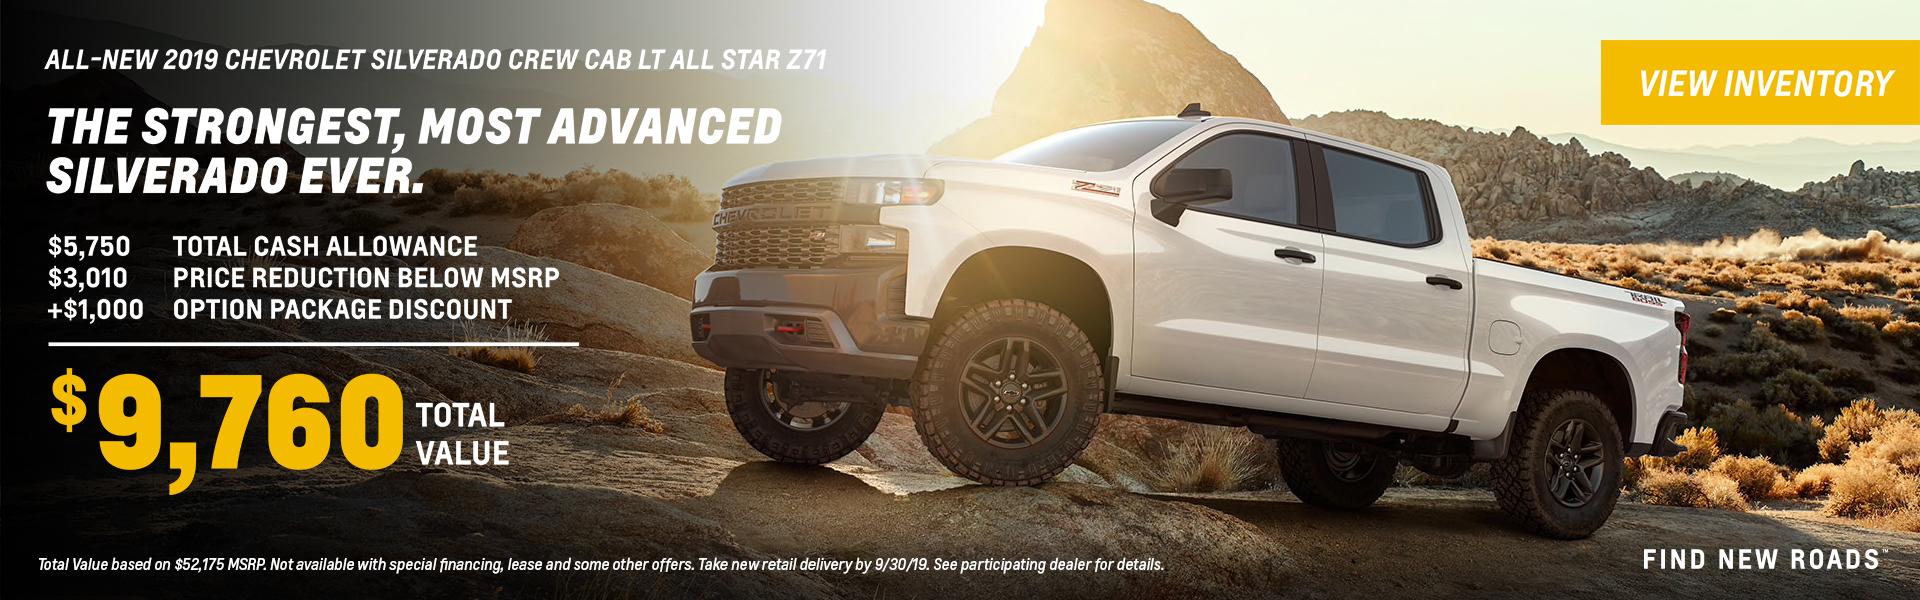 New & Used Chevrolet Dealer | Rancho Cucamonga, Pomona